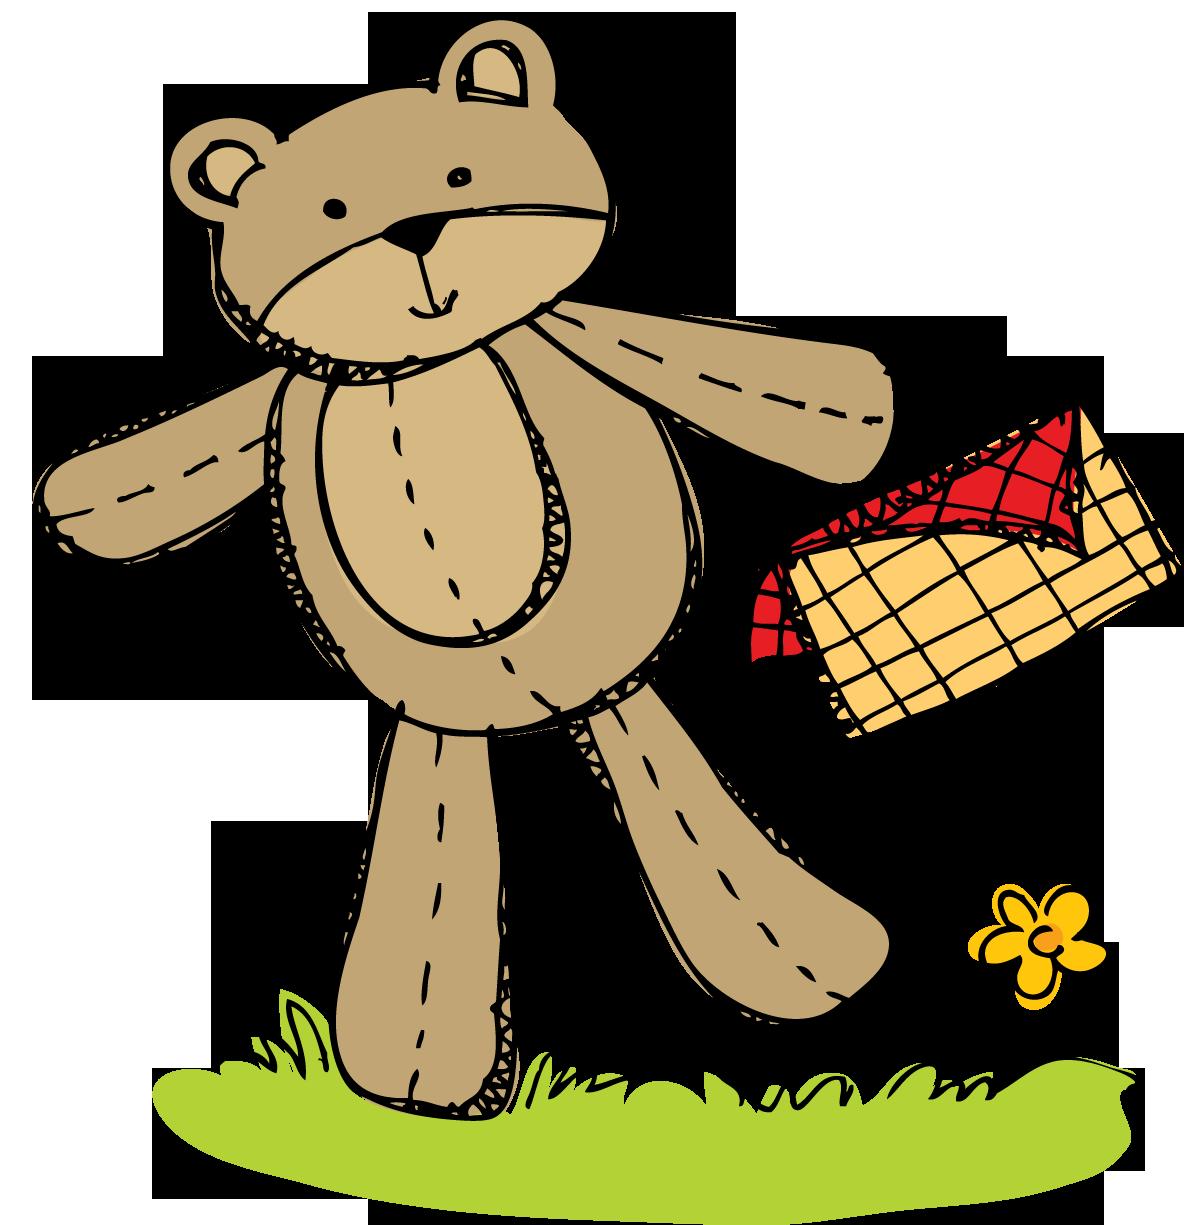 1184x1225 Teddy Bear Picnic Day